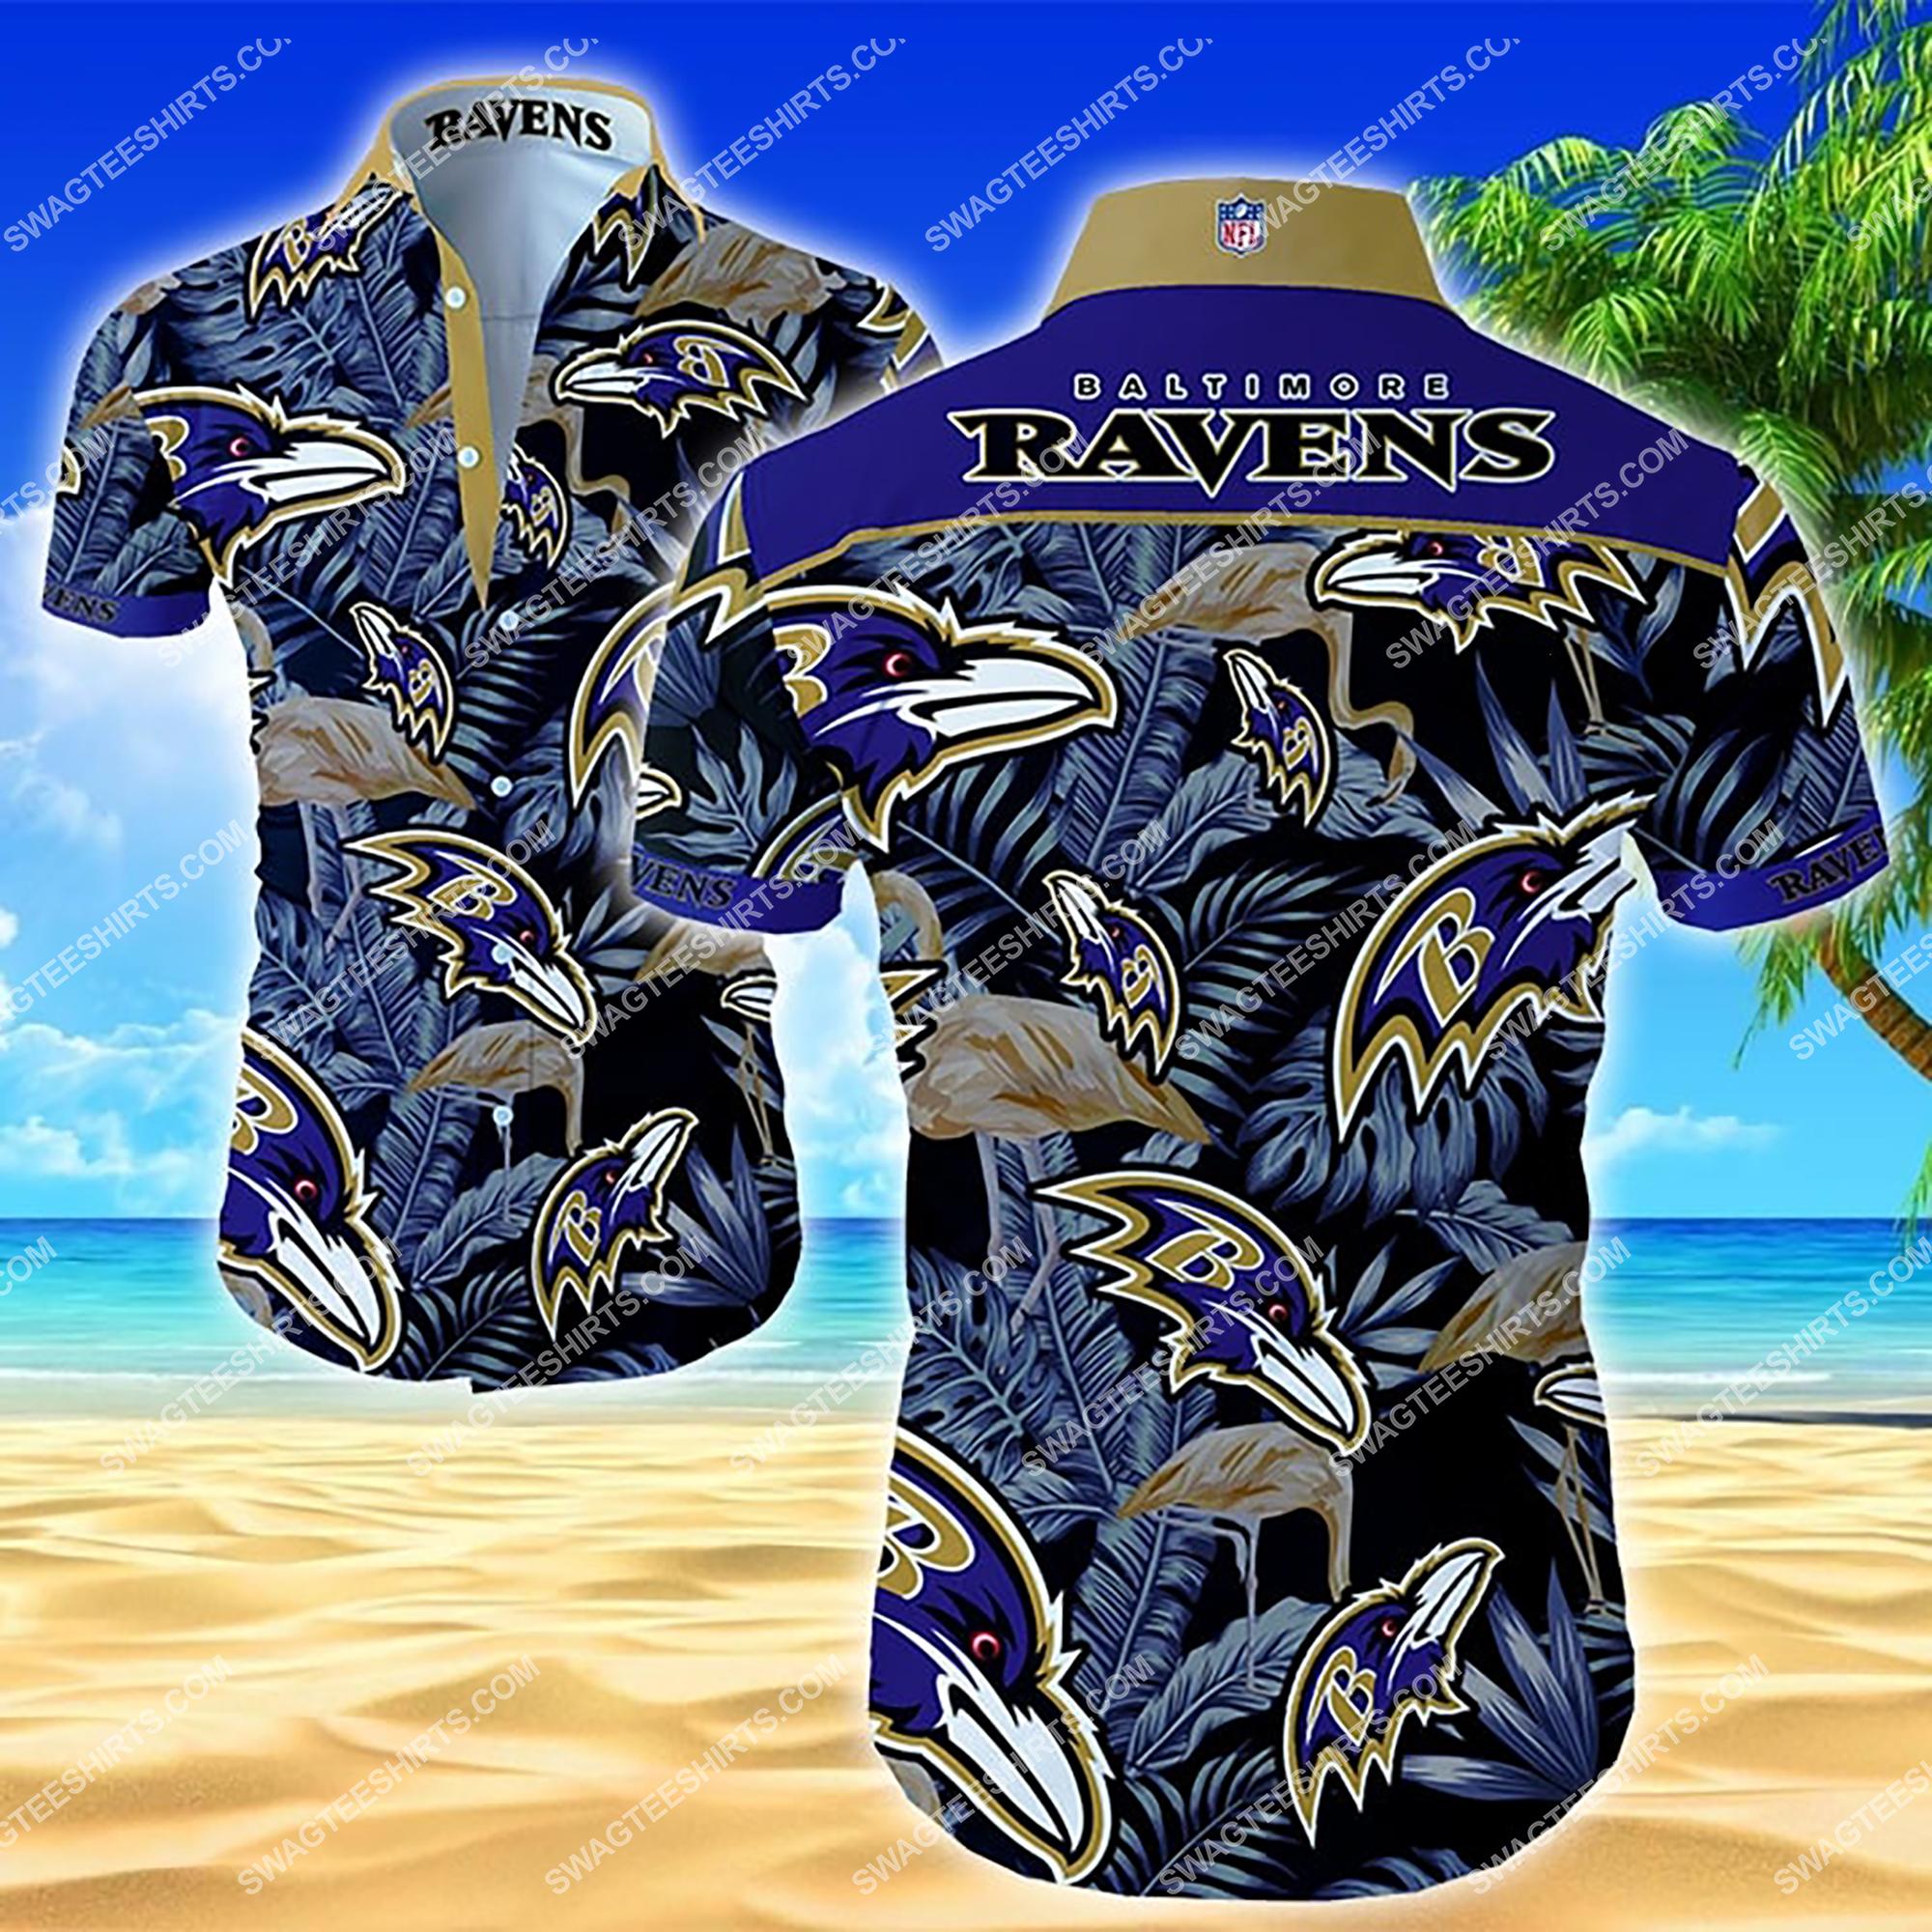 nfl baltimore ravens football team full printing summer hawaiian shirt 2 - Copy (2)